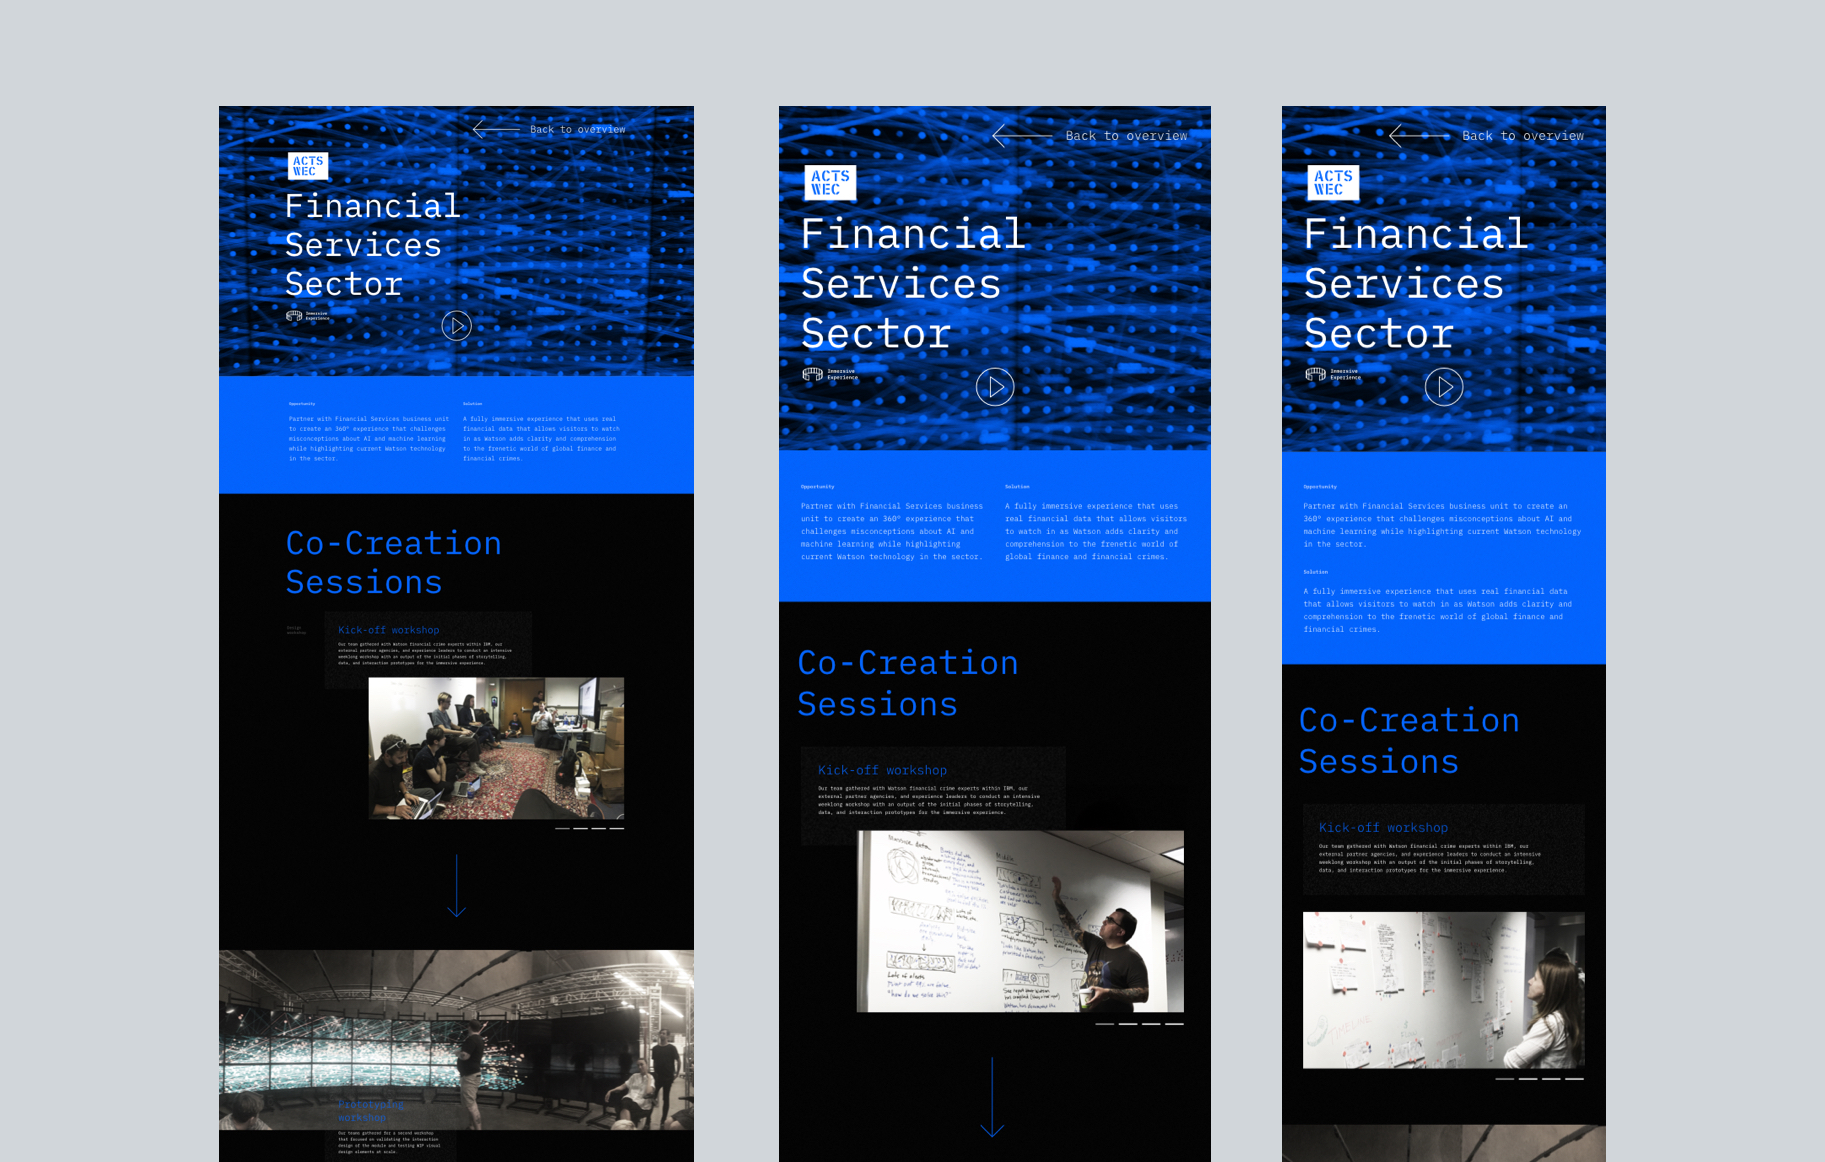 Case study web page design.